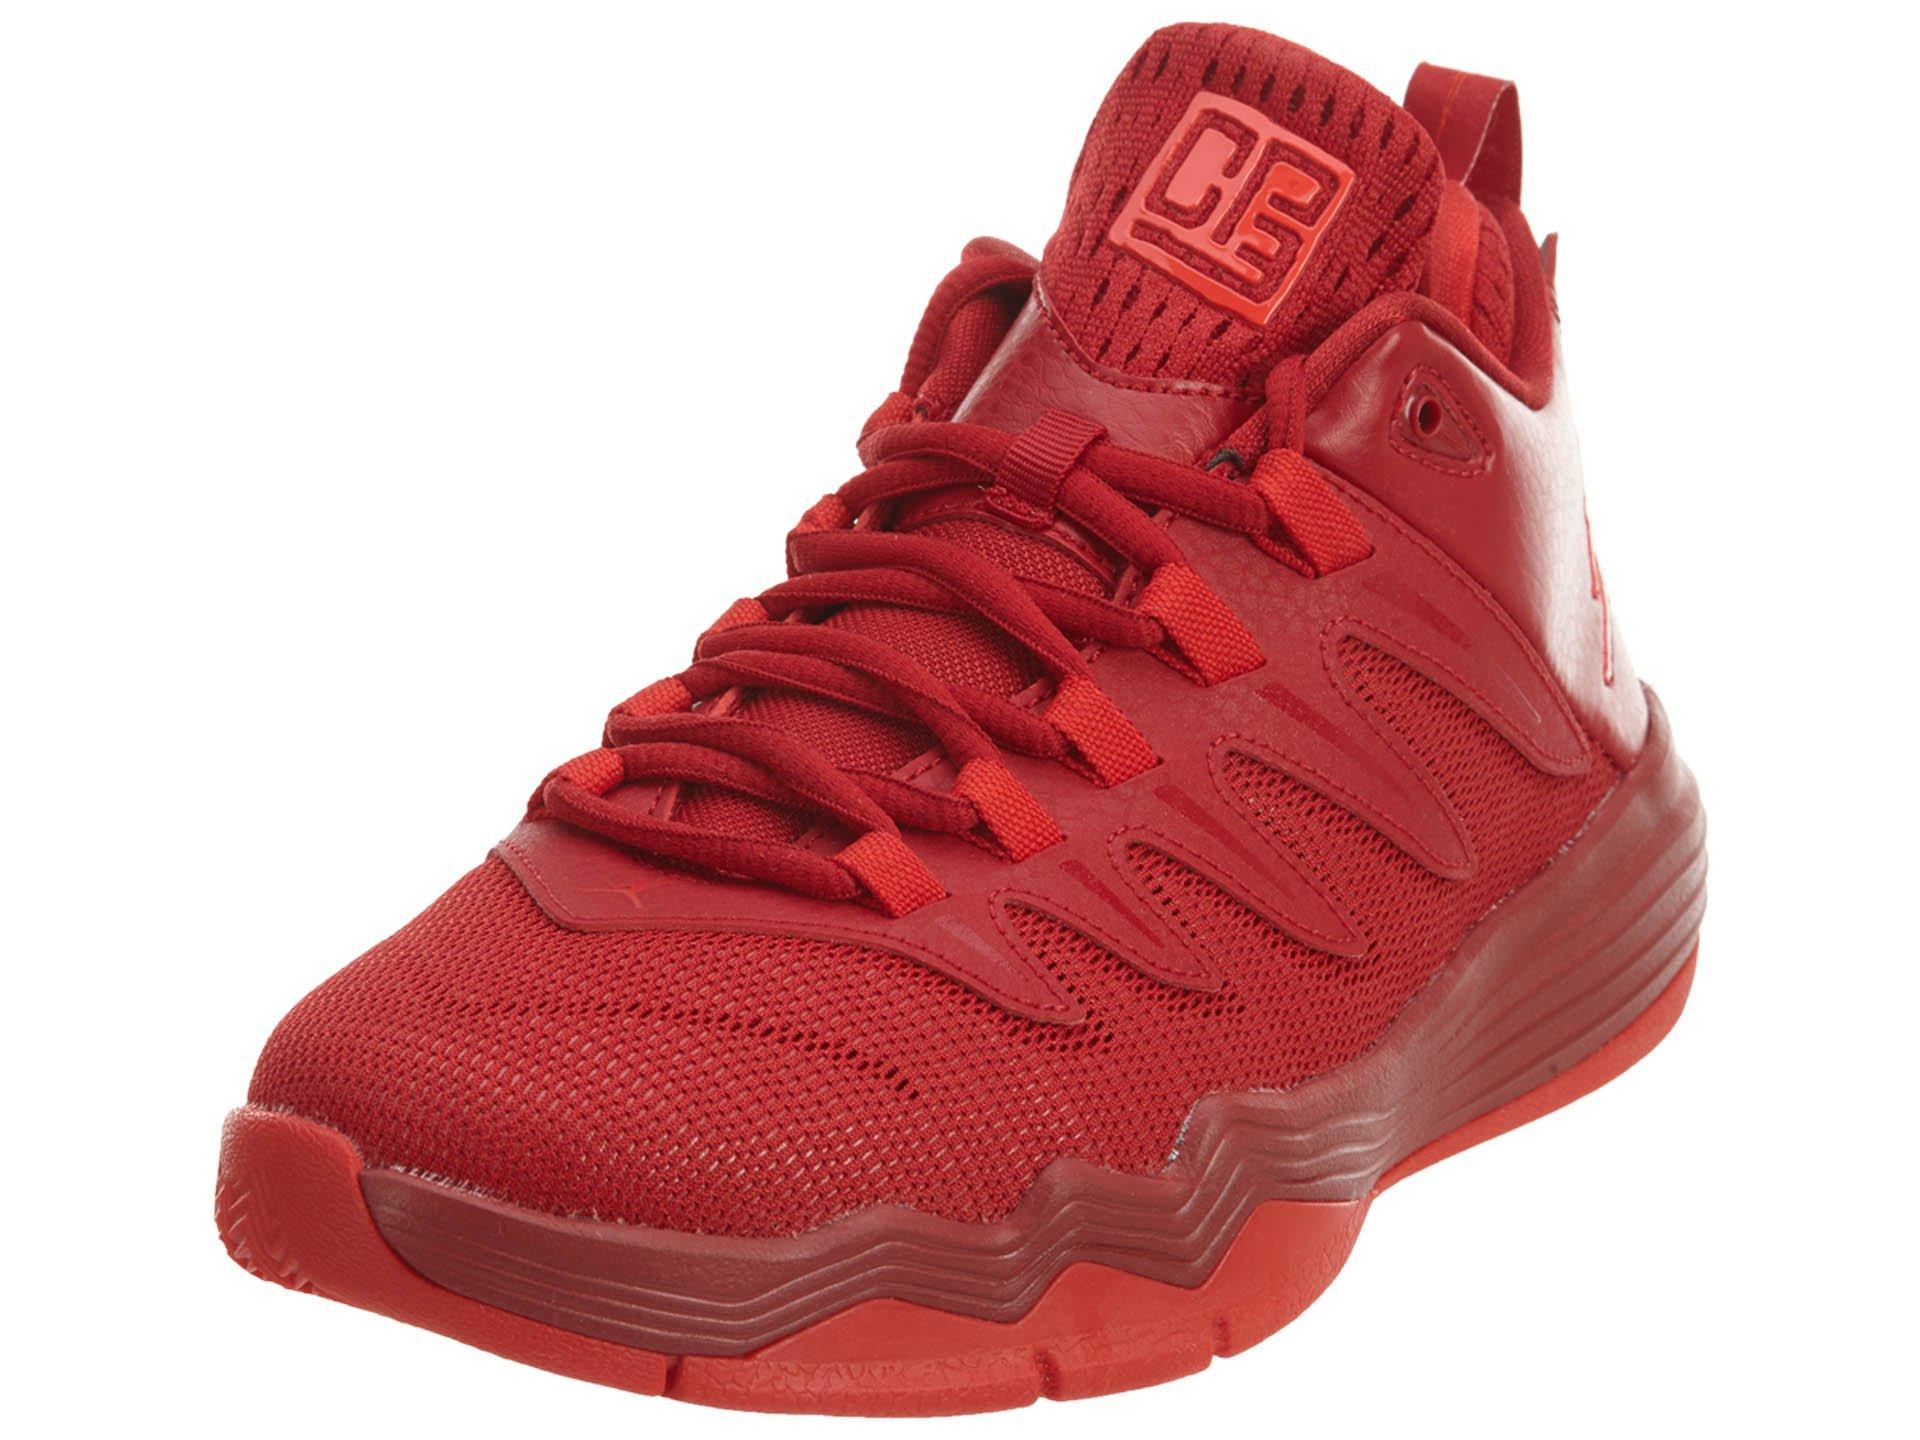 Jordan Nike Kids CP3.IX BG Gym Red/Chlling Red Infrrd 23 Basketball Shoe 5 Kids US by Jordan